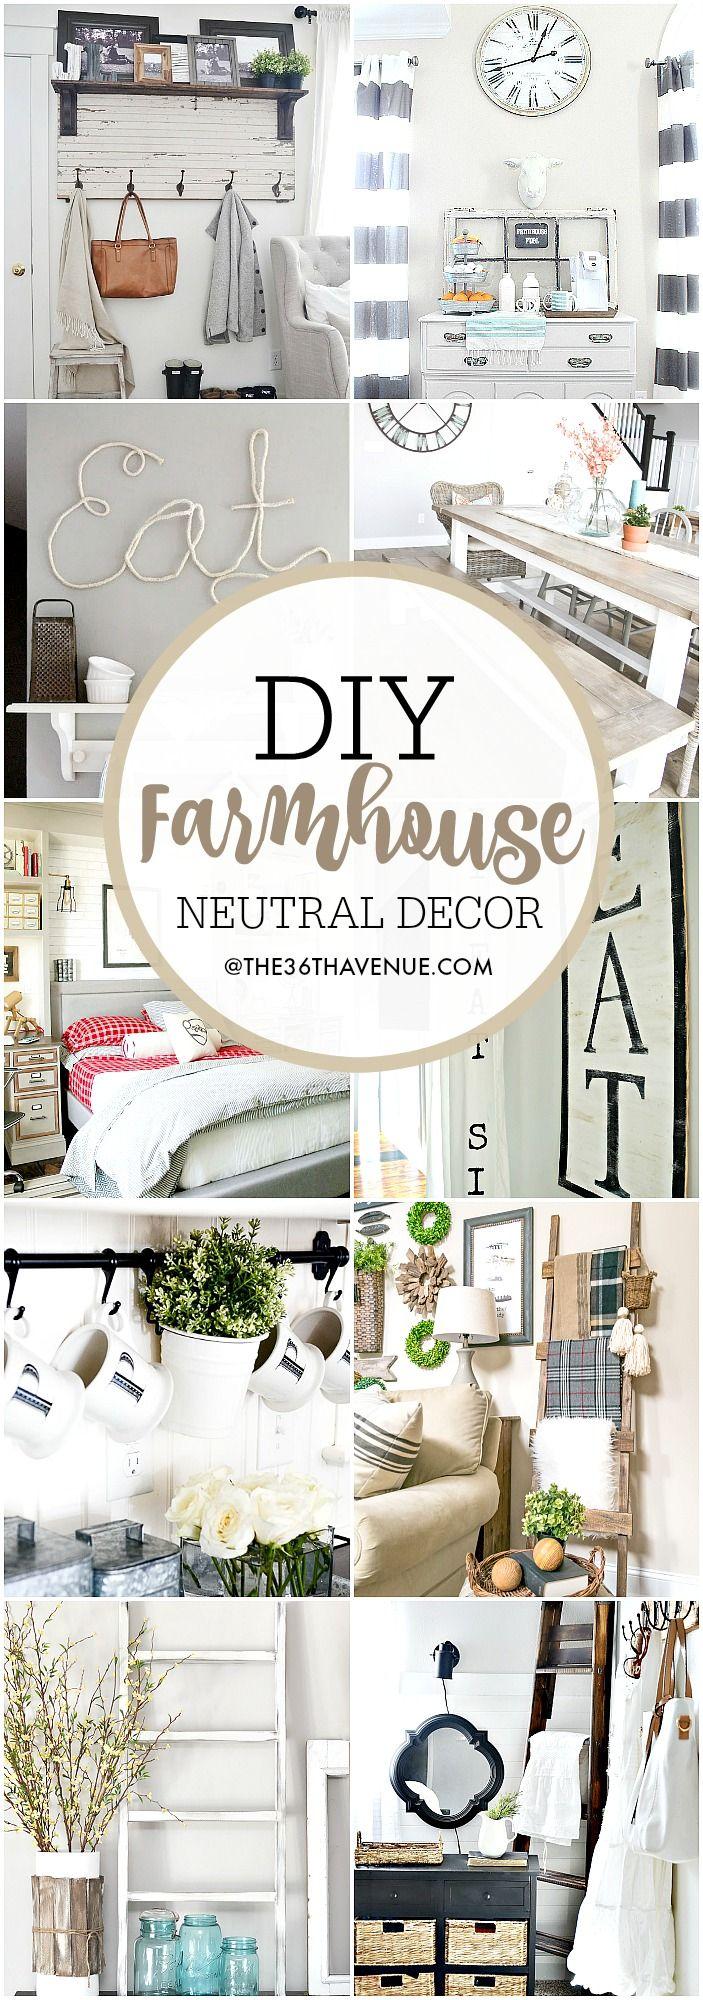 Farmhouse DIY Home Decor Ideas   Pinterest   Country living, Classic ...